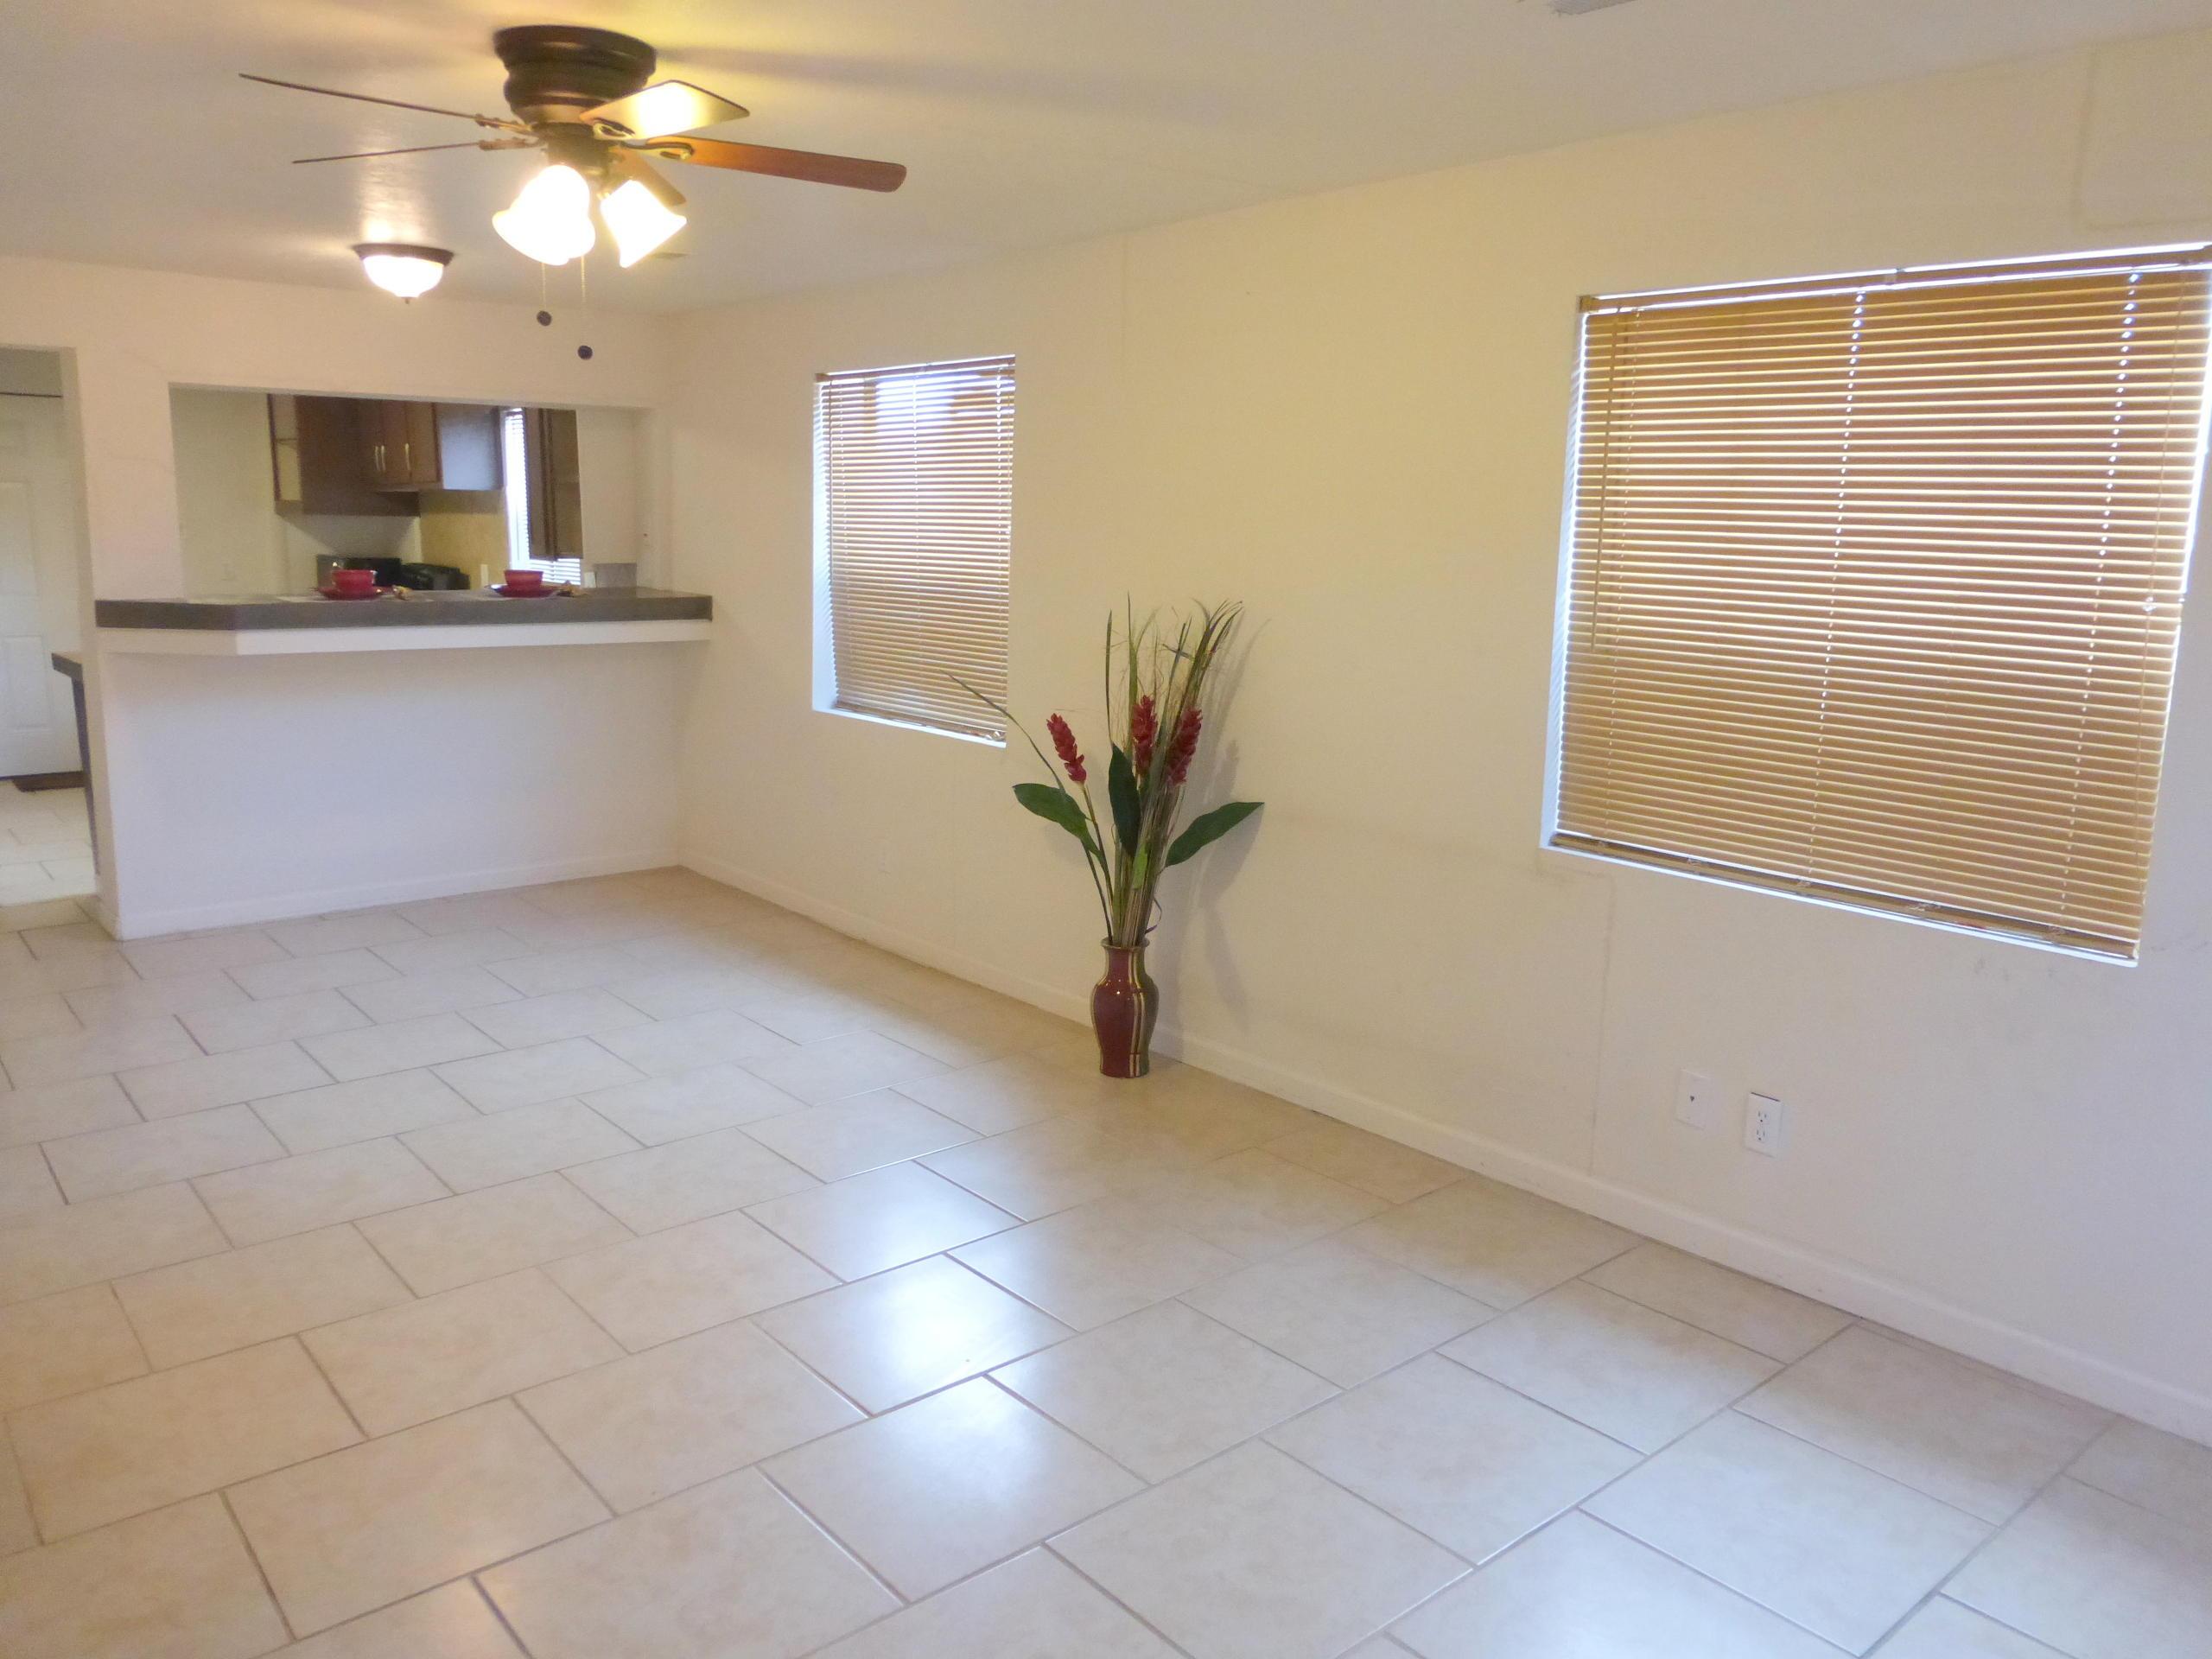 1011 ARNO ST NE Property Photo - Albuquerque, NM real estate listing